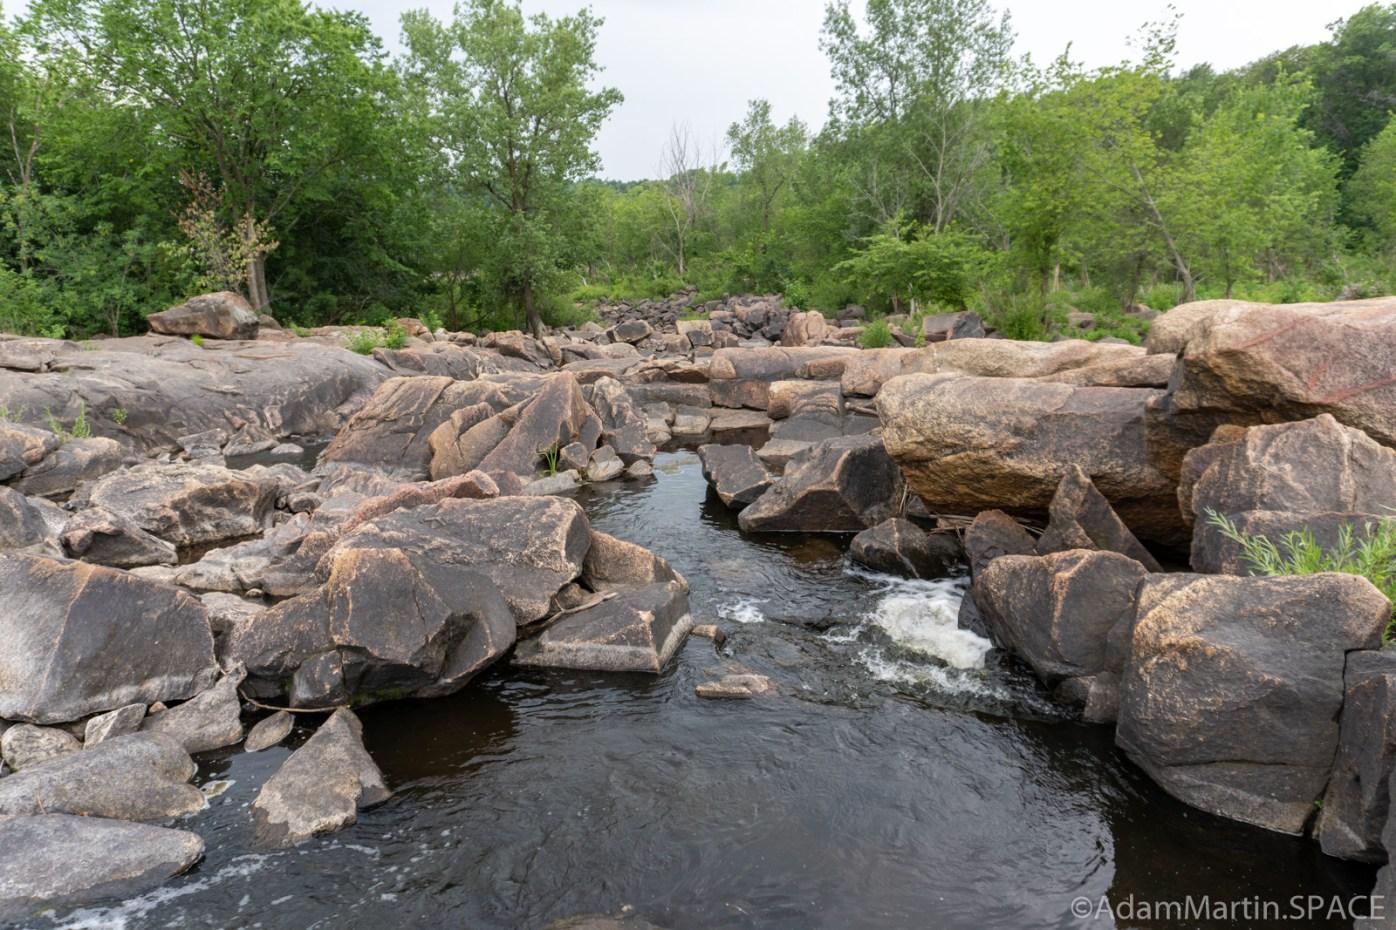 Lake Wissota Rapids - Downstream view over boulders